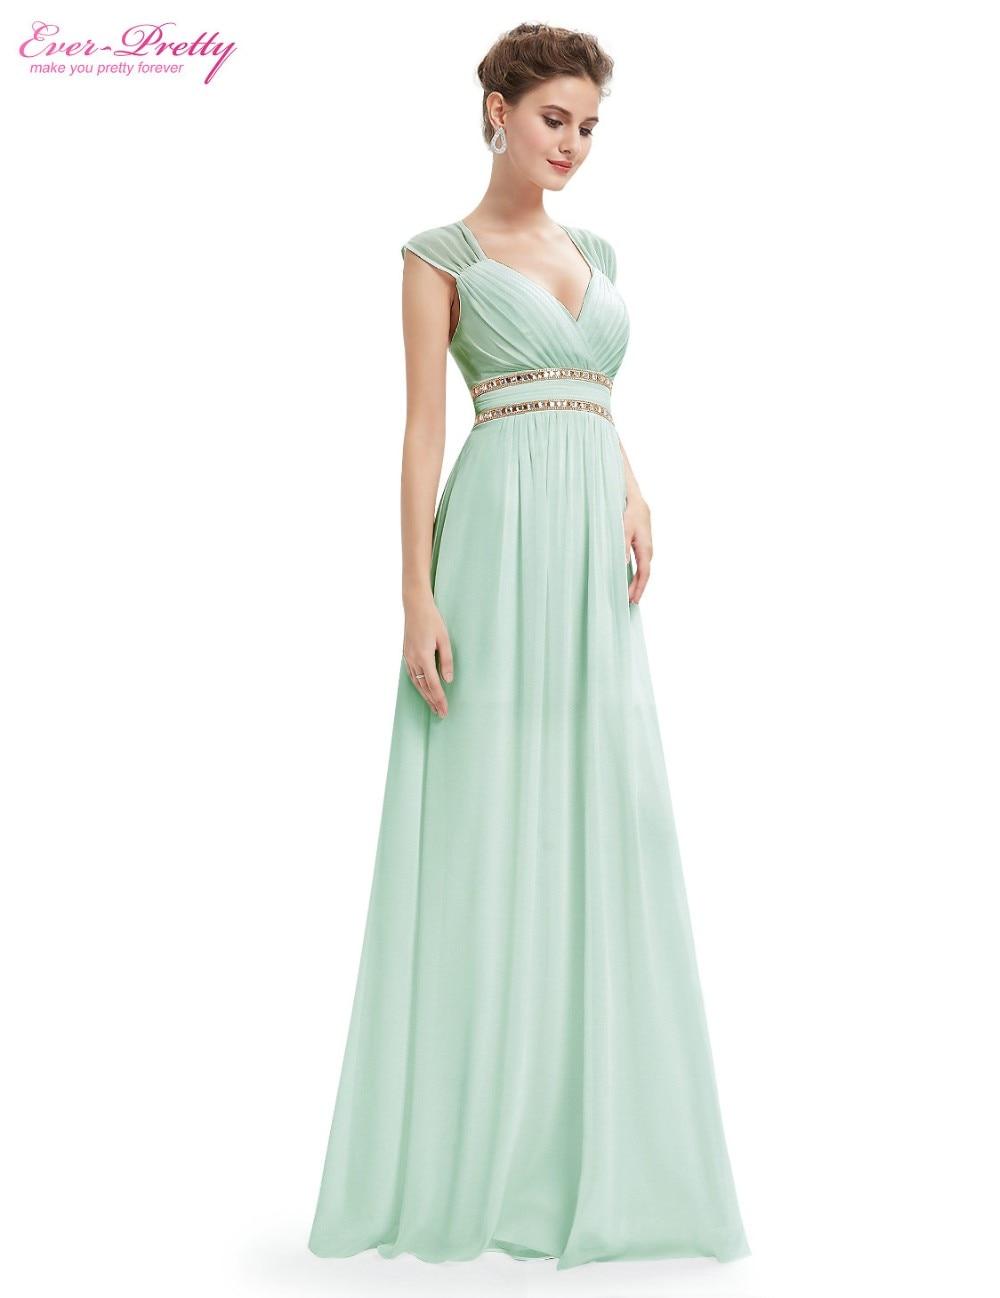 400073e3fbc6 Ever Pretty Evening dresses EP08697 Women's Beautiful Elegant Sexy Navy  Blue White V neck Long Prom Dresses 2016 New Arrival-in Evening Dresses  from ...